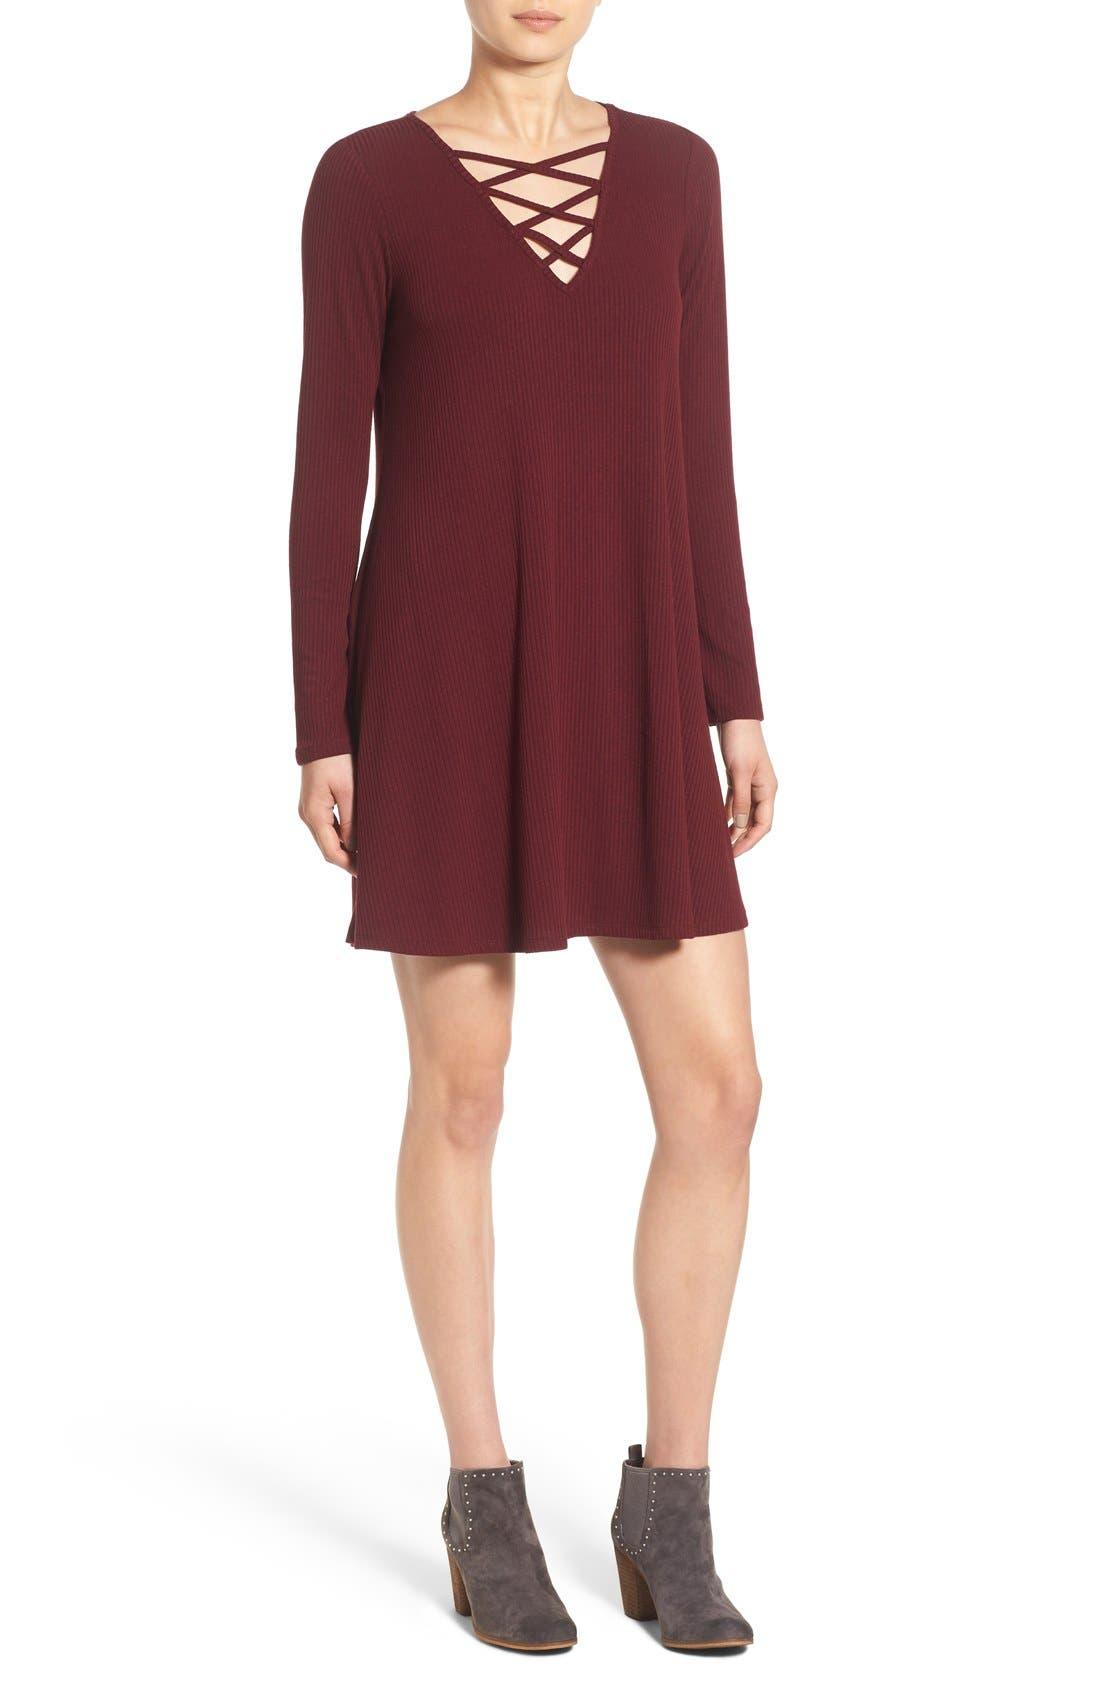 Alternate Image 1 Selected - Love, Fire Long Sleeve Rib Knit Dress